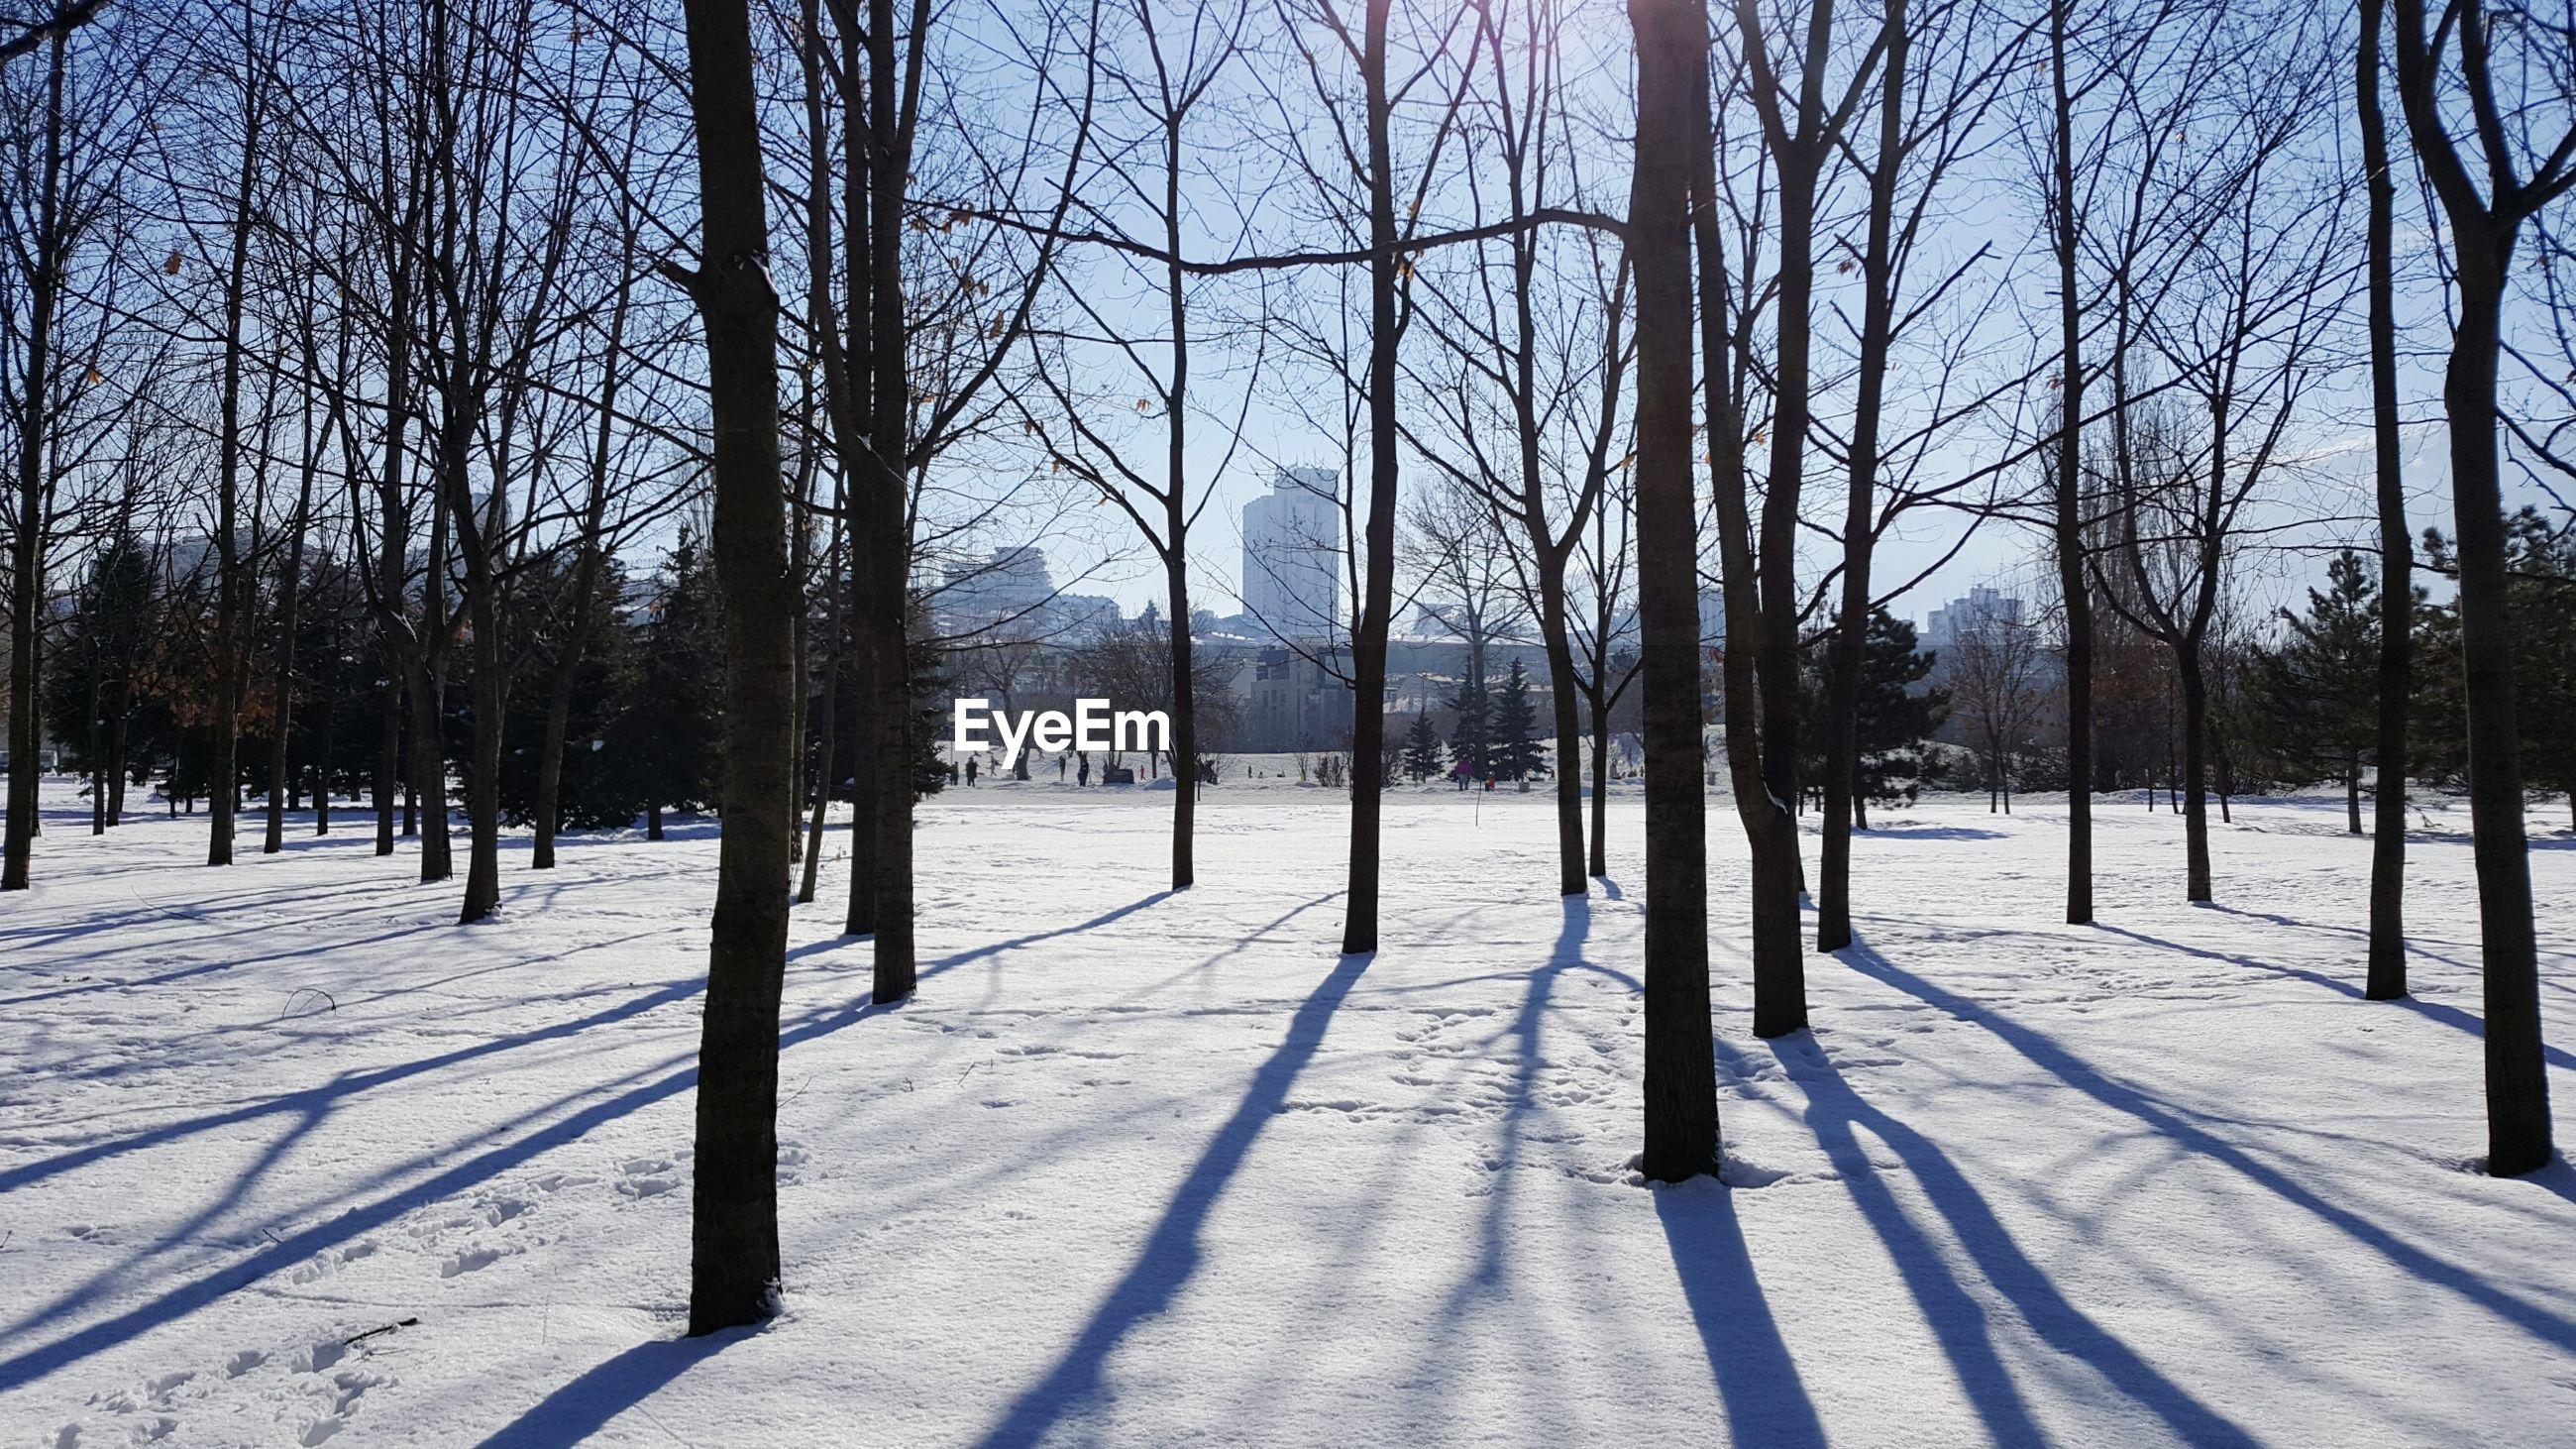 TREES ON SNOWY LANDSCAPE